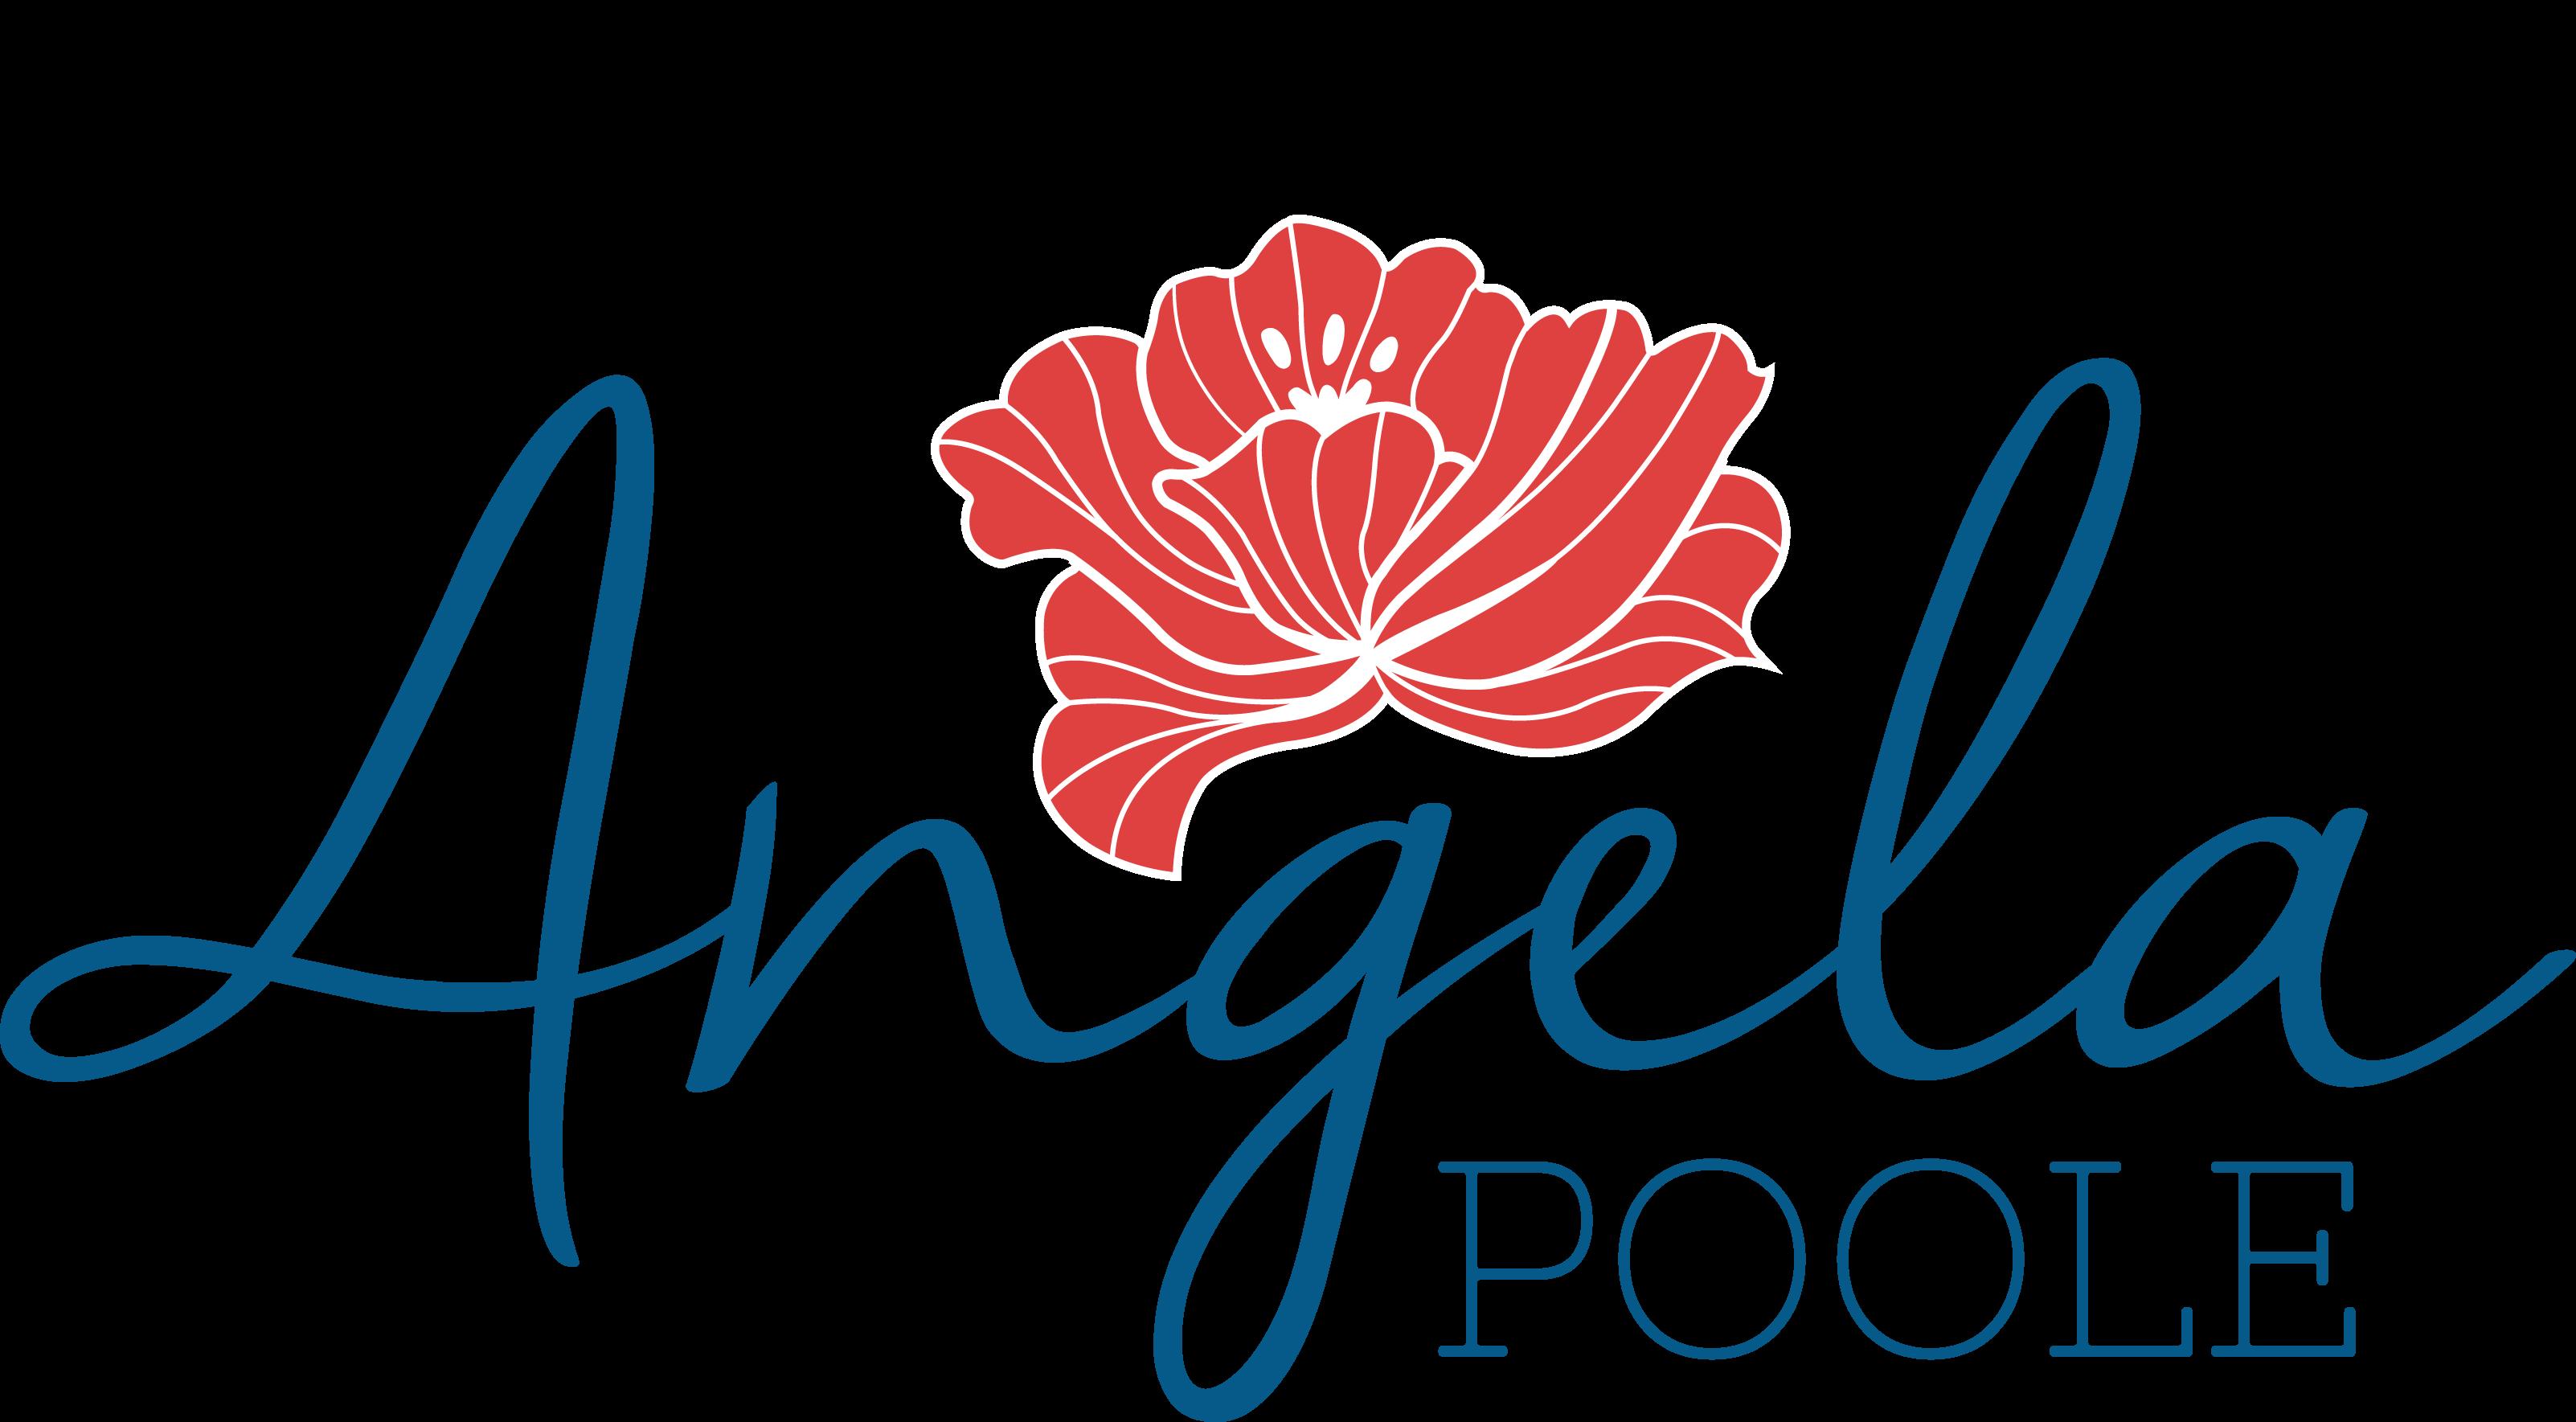 Angela Poole Crafts